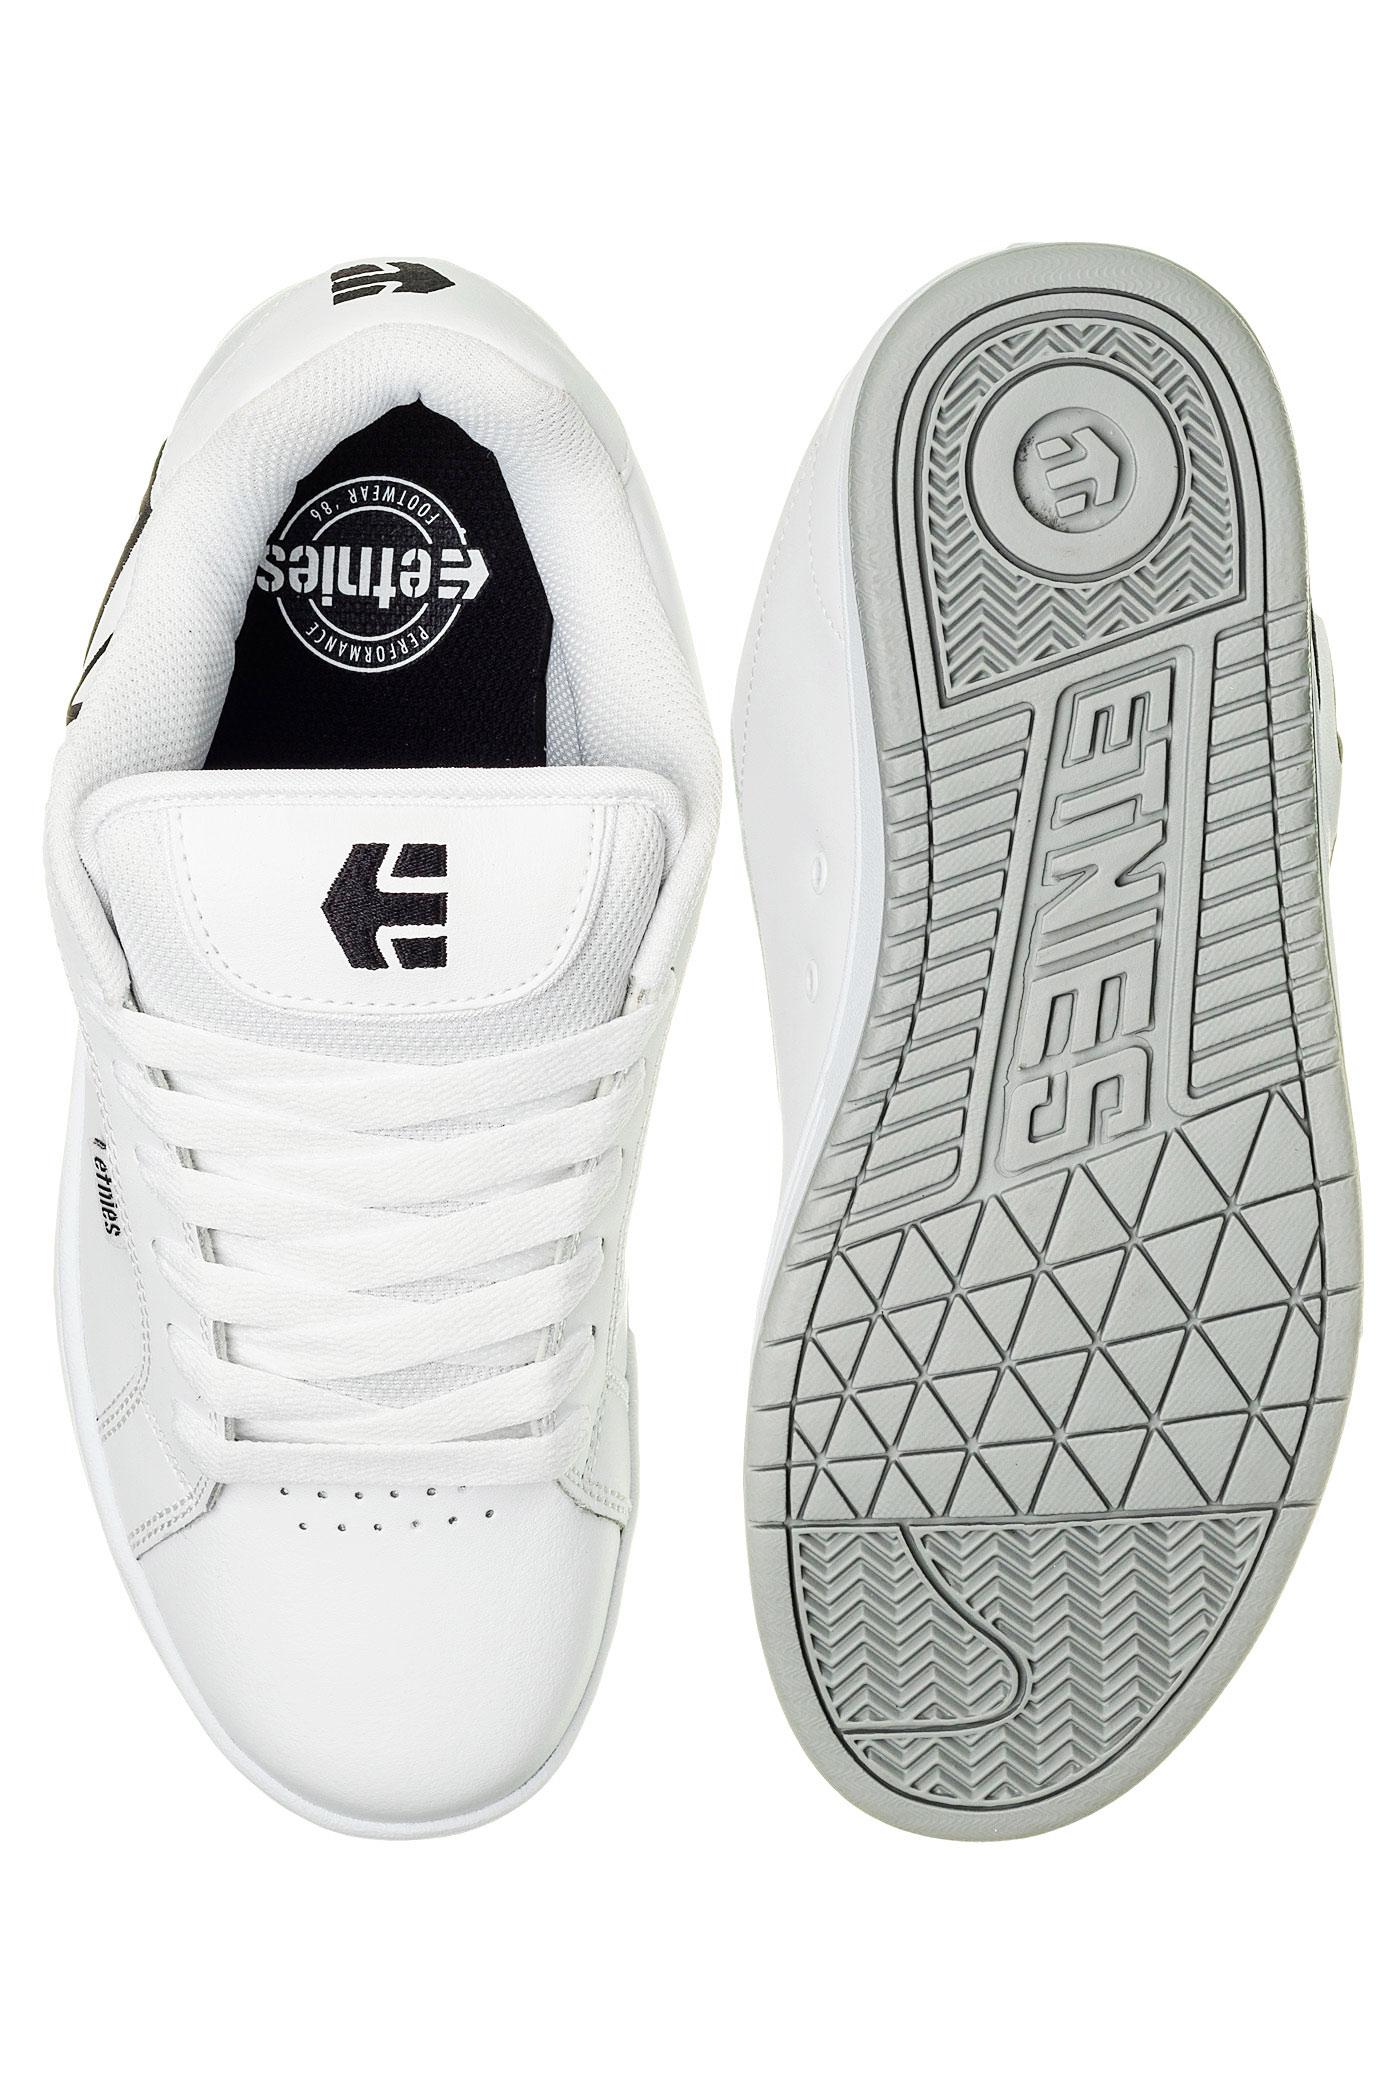 Chaussurewhite Fader Etnies Fader Chaussurewhite Silver Etnies Silver DH9W2IYbEe